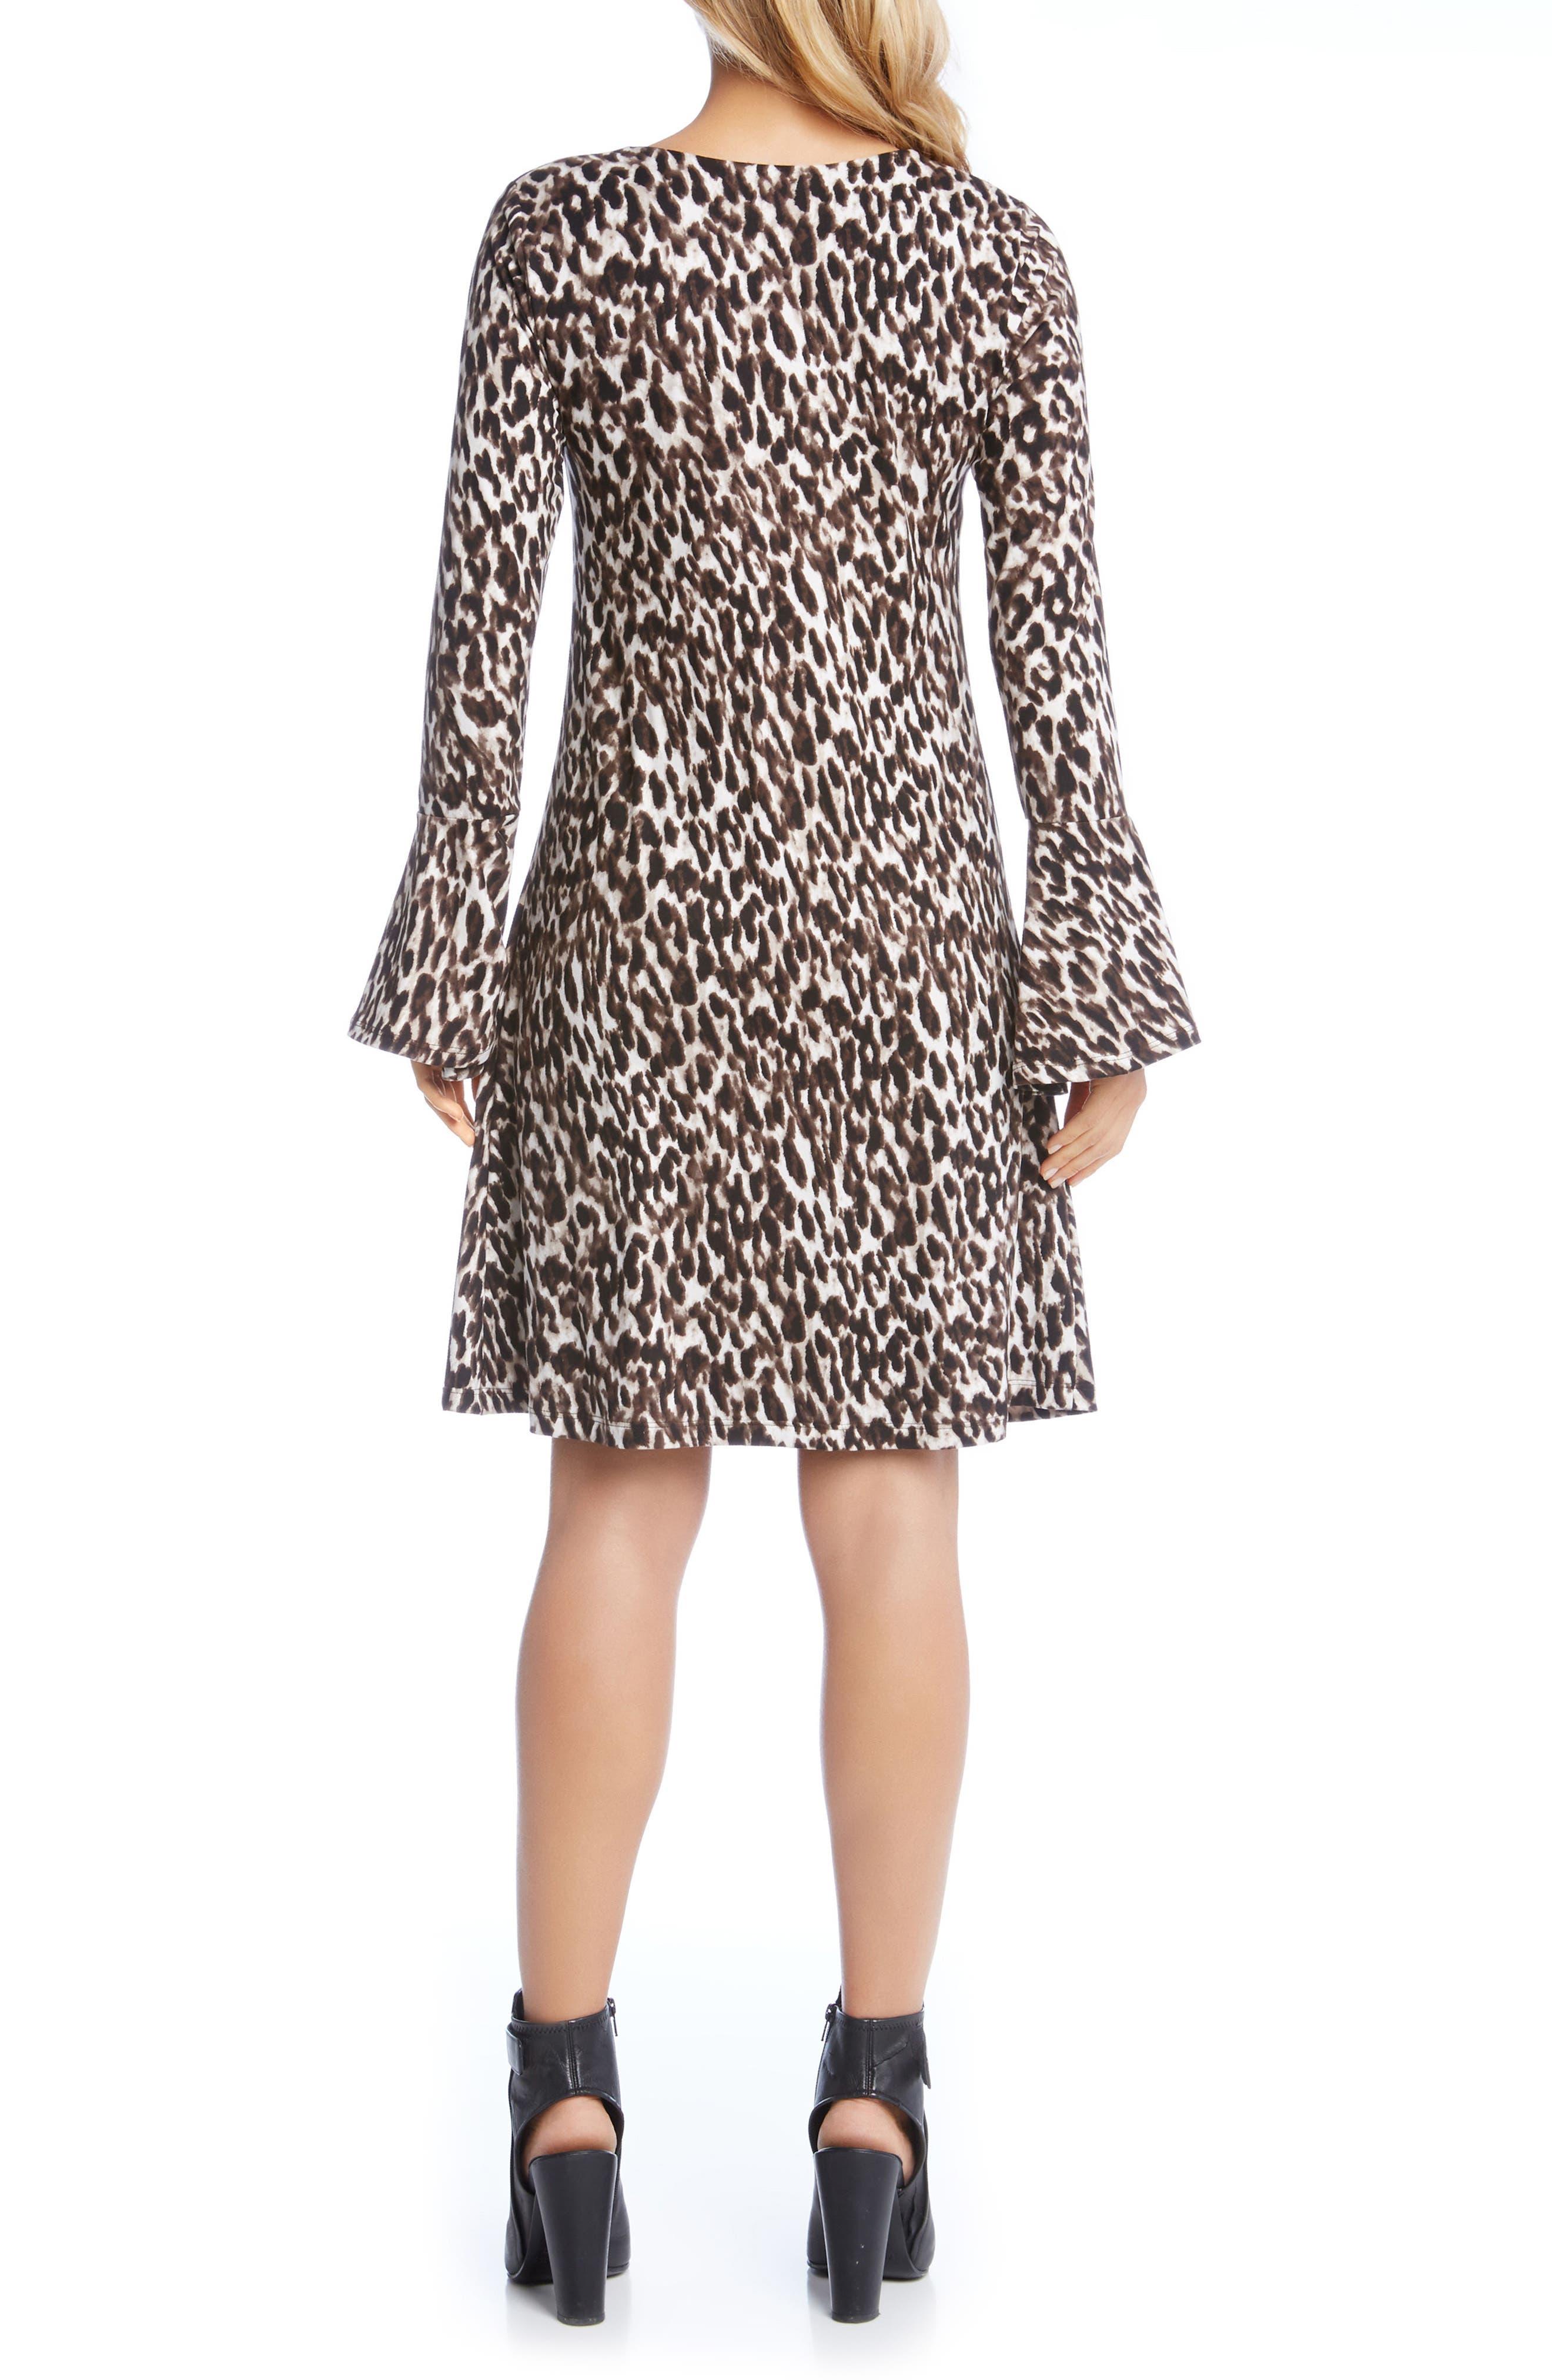 Bell Sleeve Brushed Knit Dress,                             Alternate thumbnail 2, color,                             Leopard